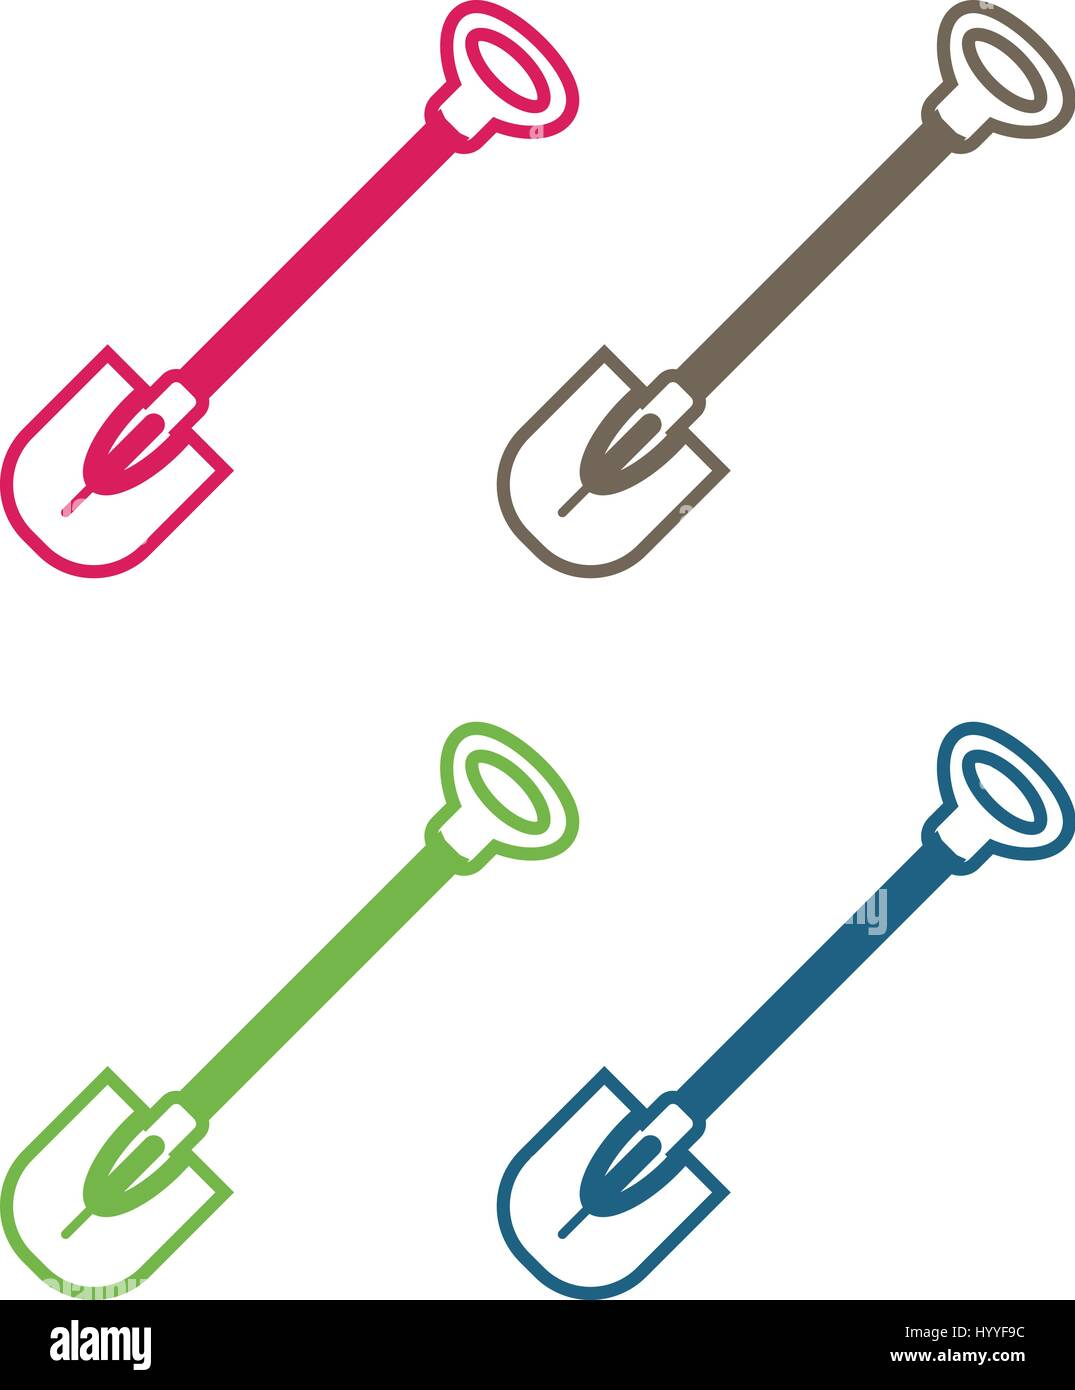 Work Tool - Shovel Icon as EPS 10 File - Stock Vector